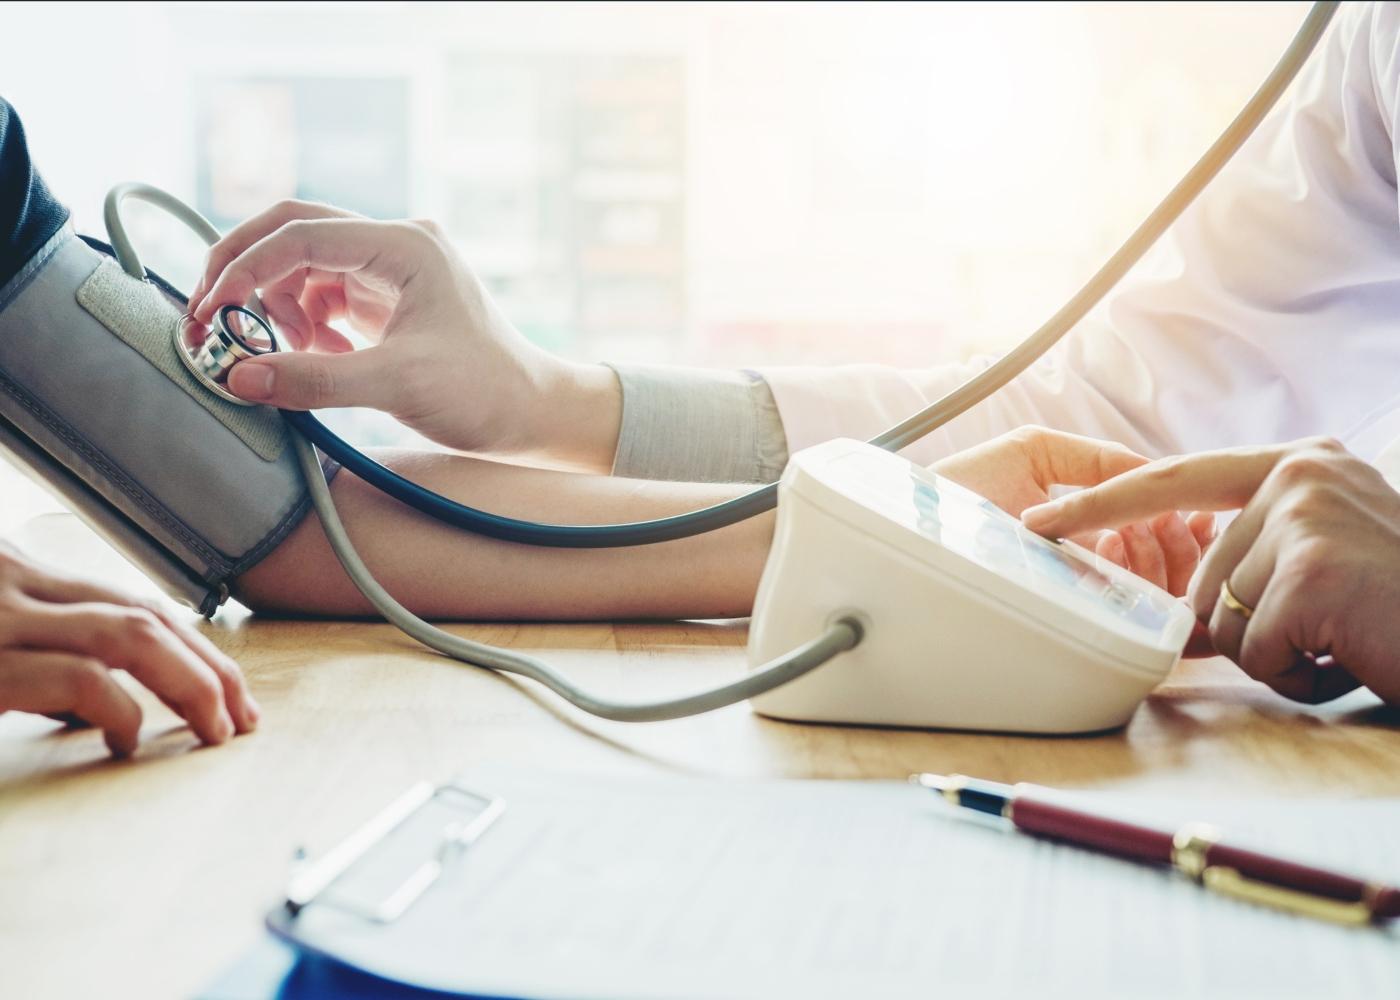 médico a medir a tensão a paciente